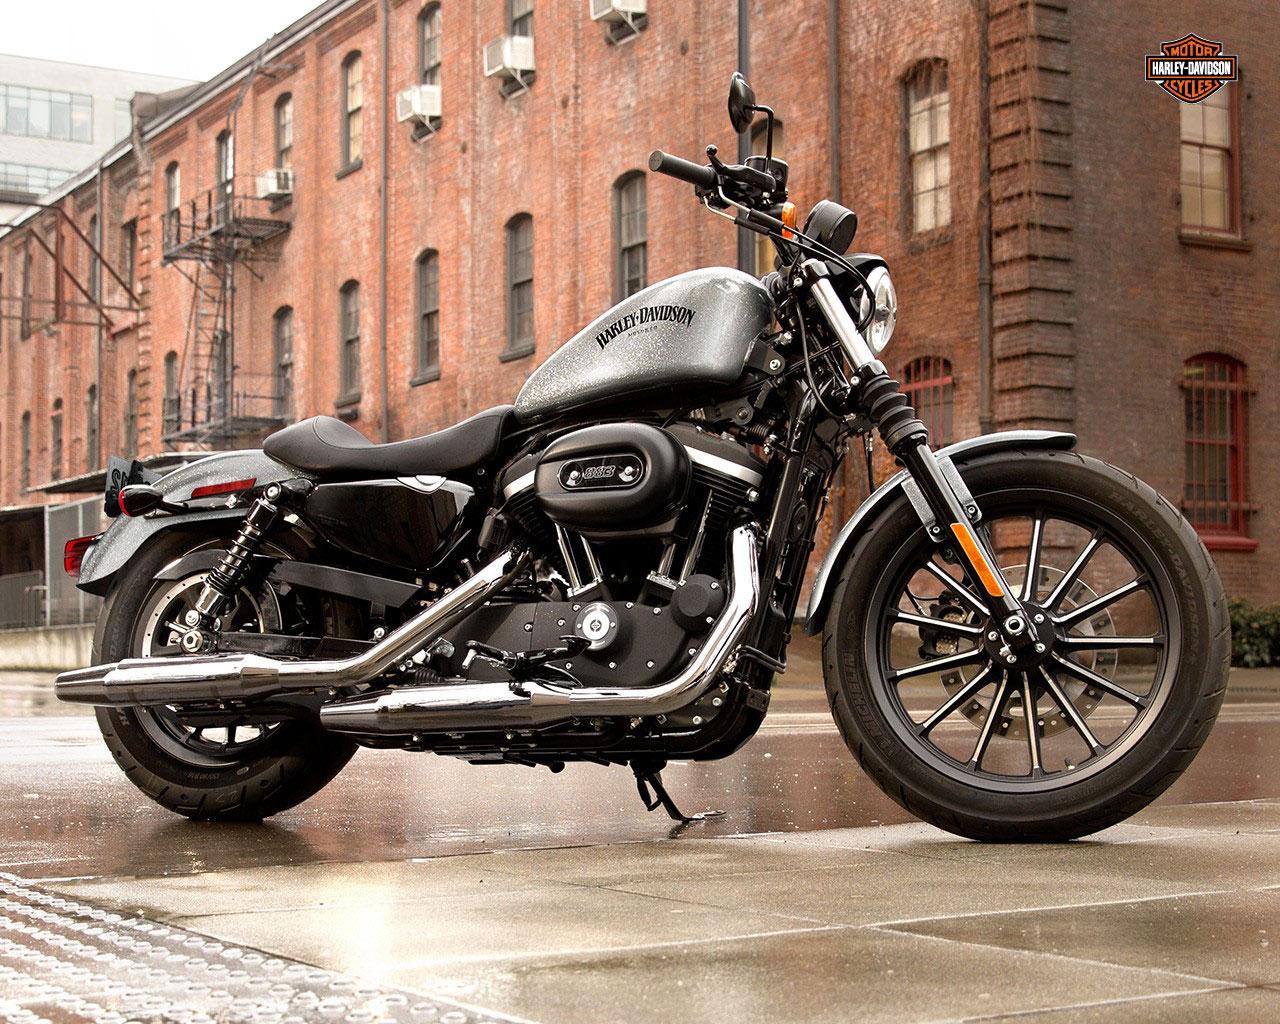 Harley Davidson iron 883 sportster | VK